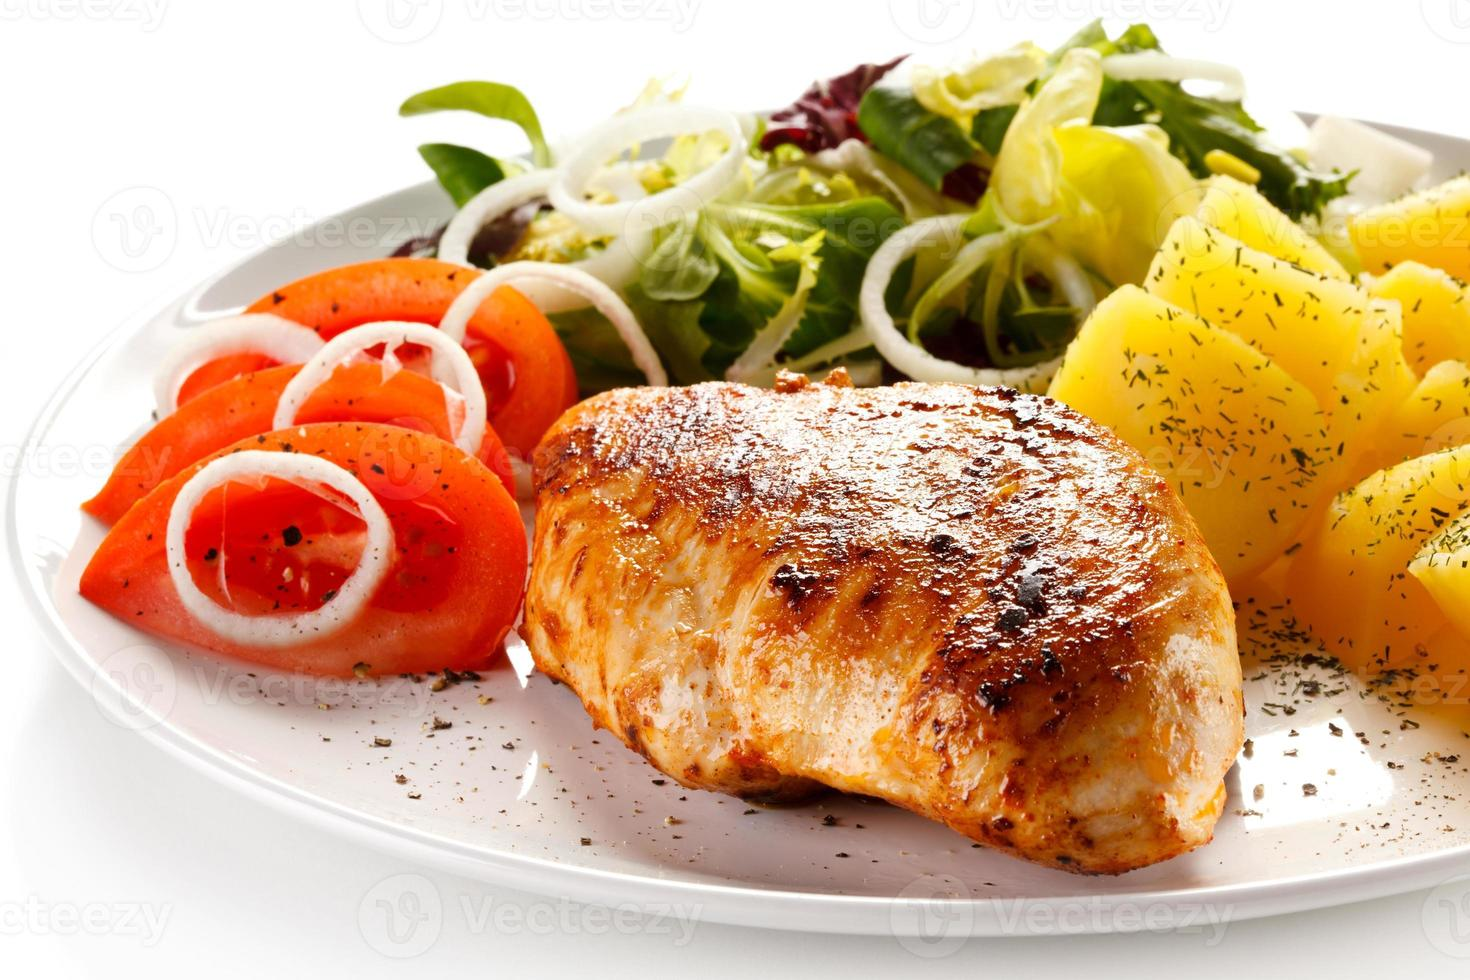 bife, batatas cozidas e legumes foto